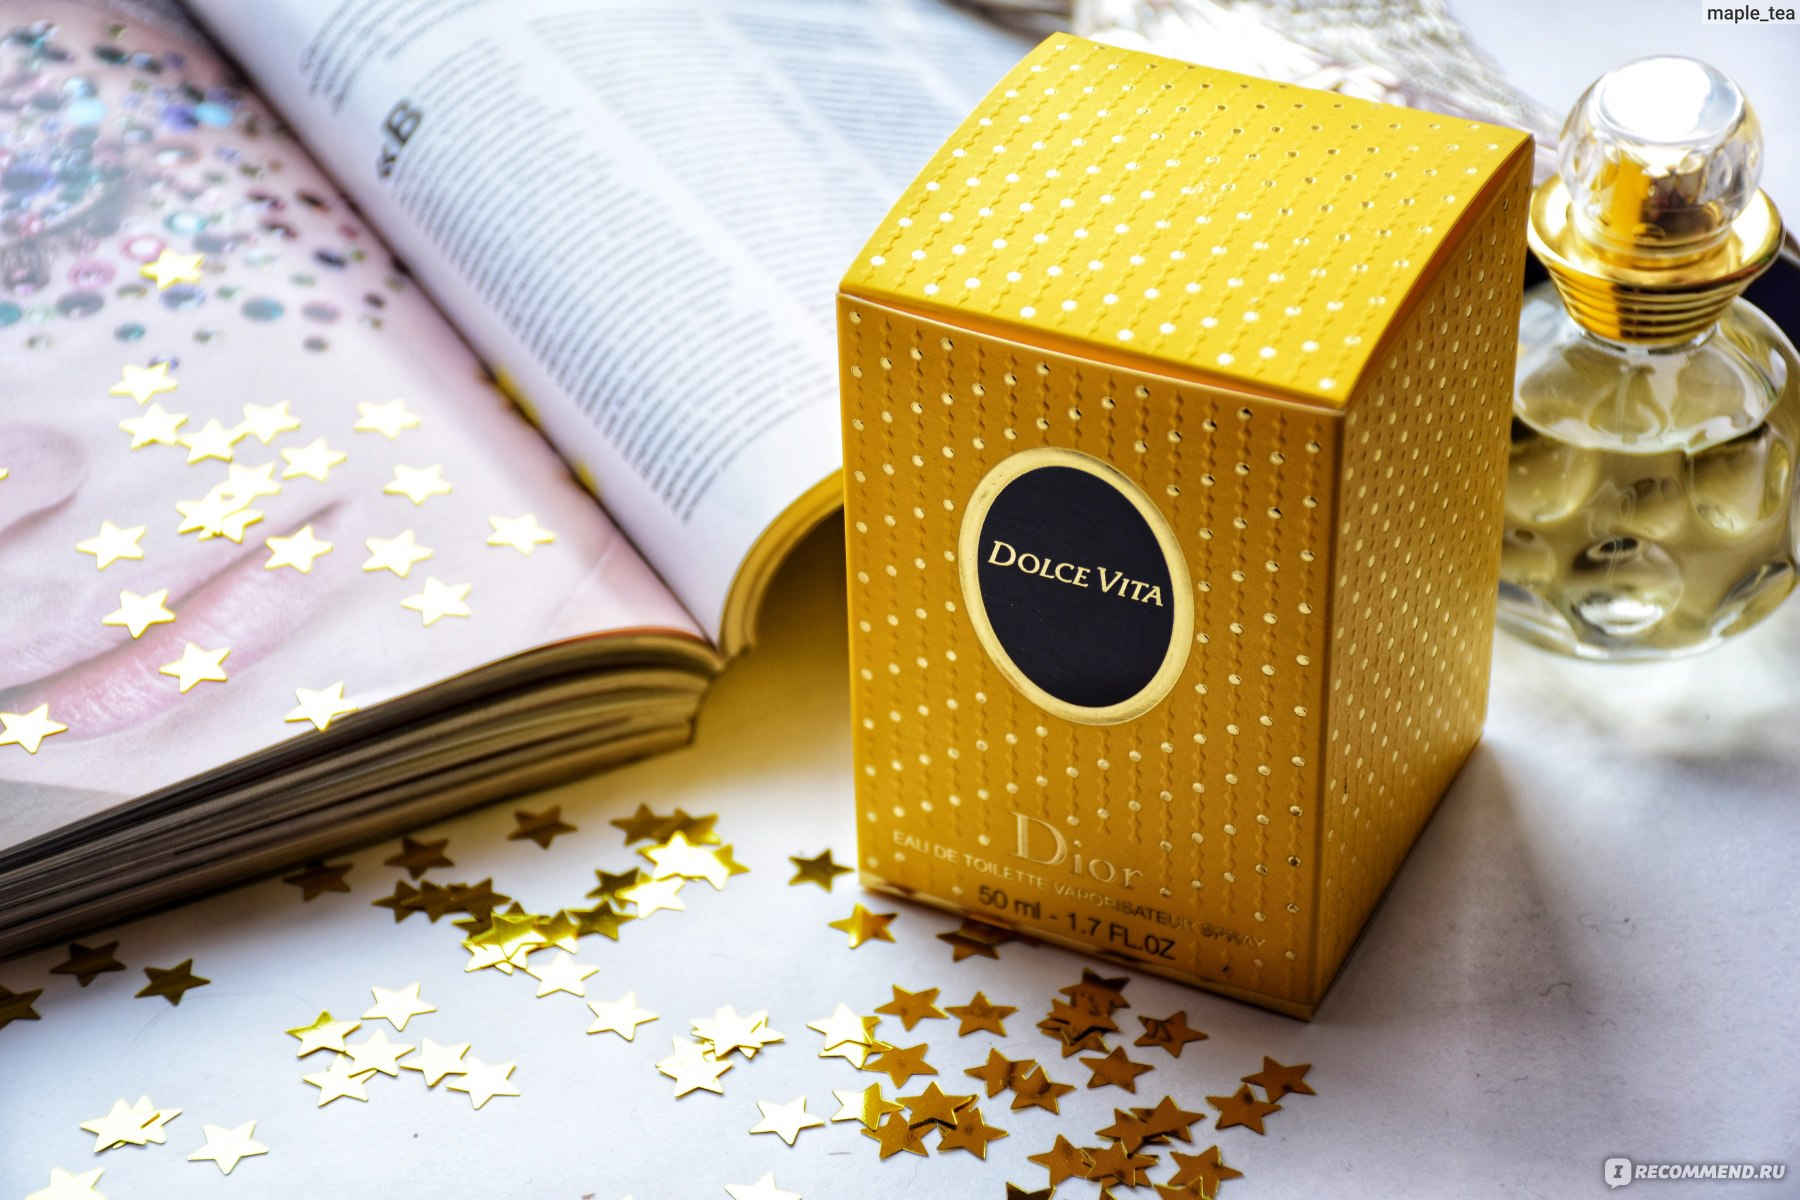 Dior Dolce Vita Dolce Vita золото инков от Dior